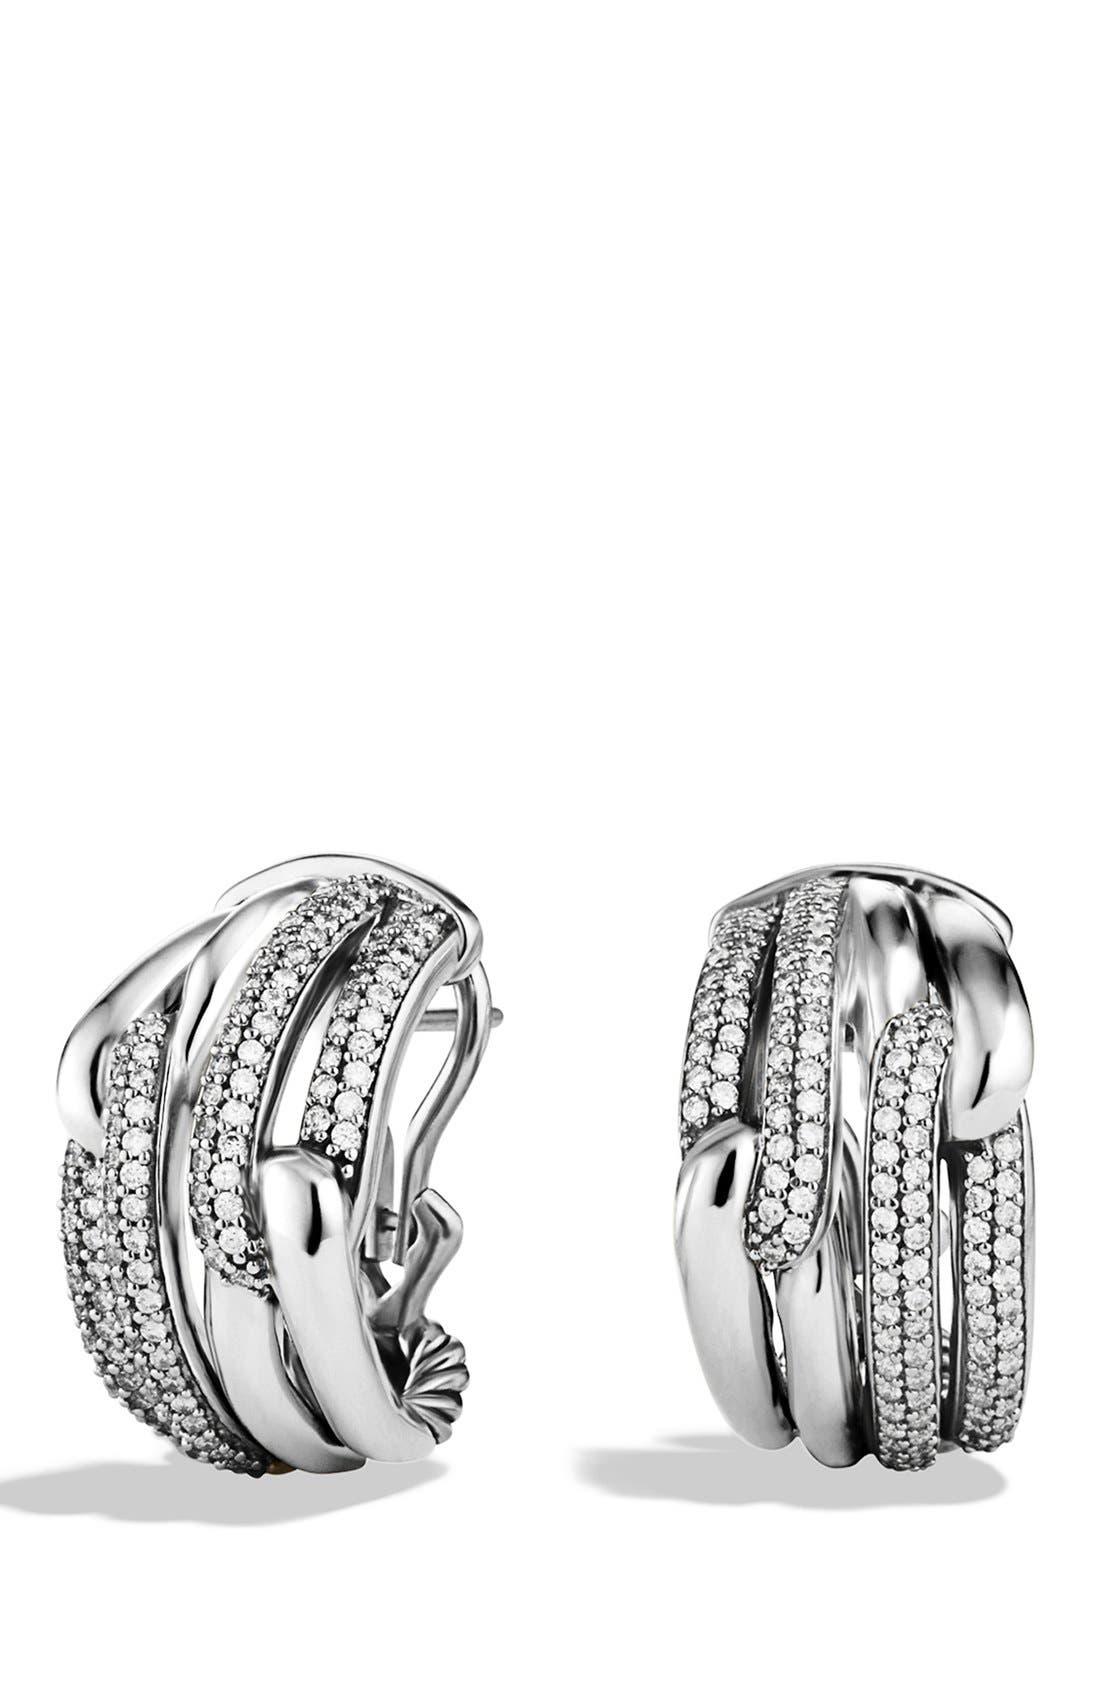 Main Image - David Yurman 'Labyrinth' Double Loop Earrings with Diamonds